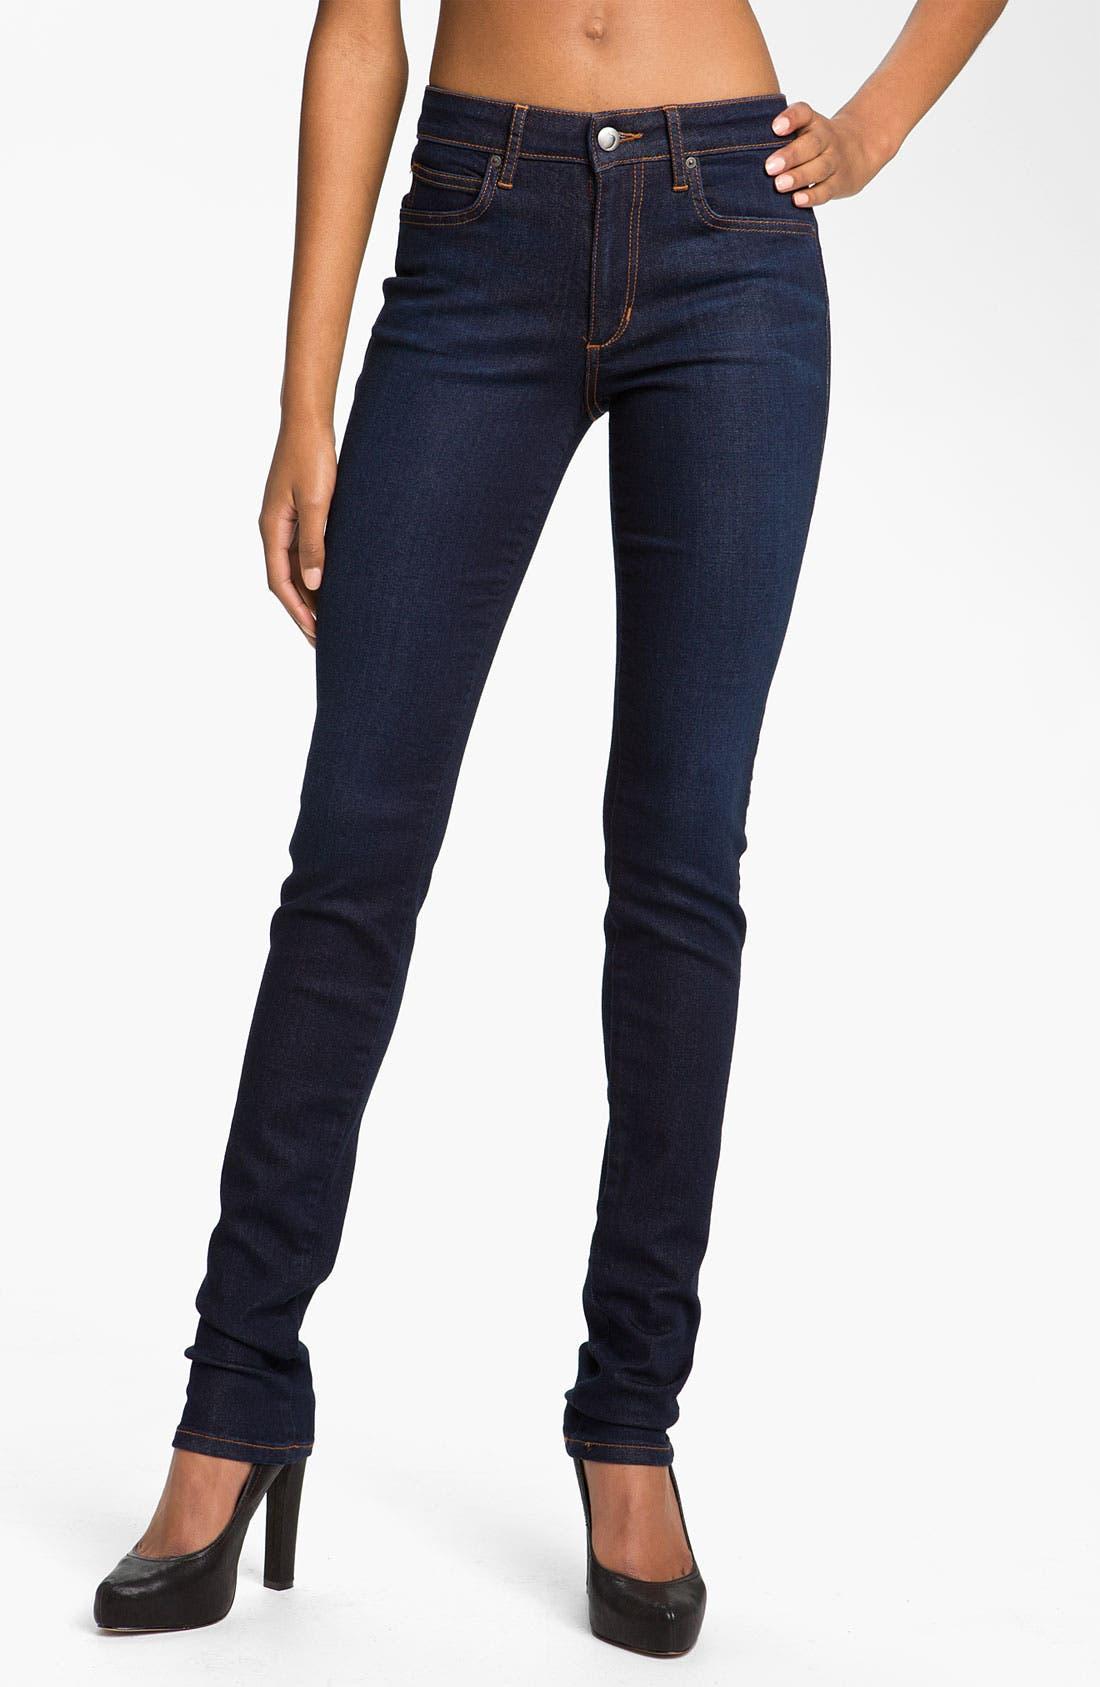 Alternate Image 1 Selected - Joe's 'The Skinny' Stretch Denim Jeans (Yasmin)